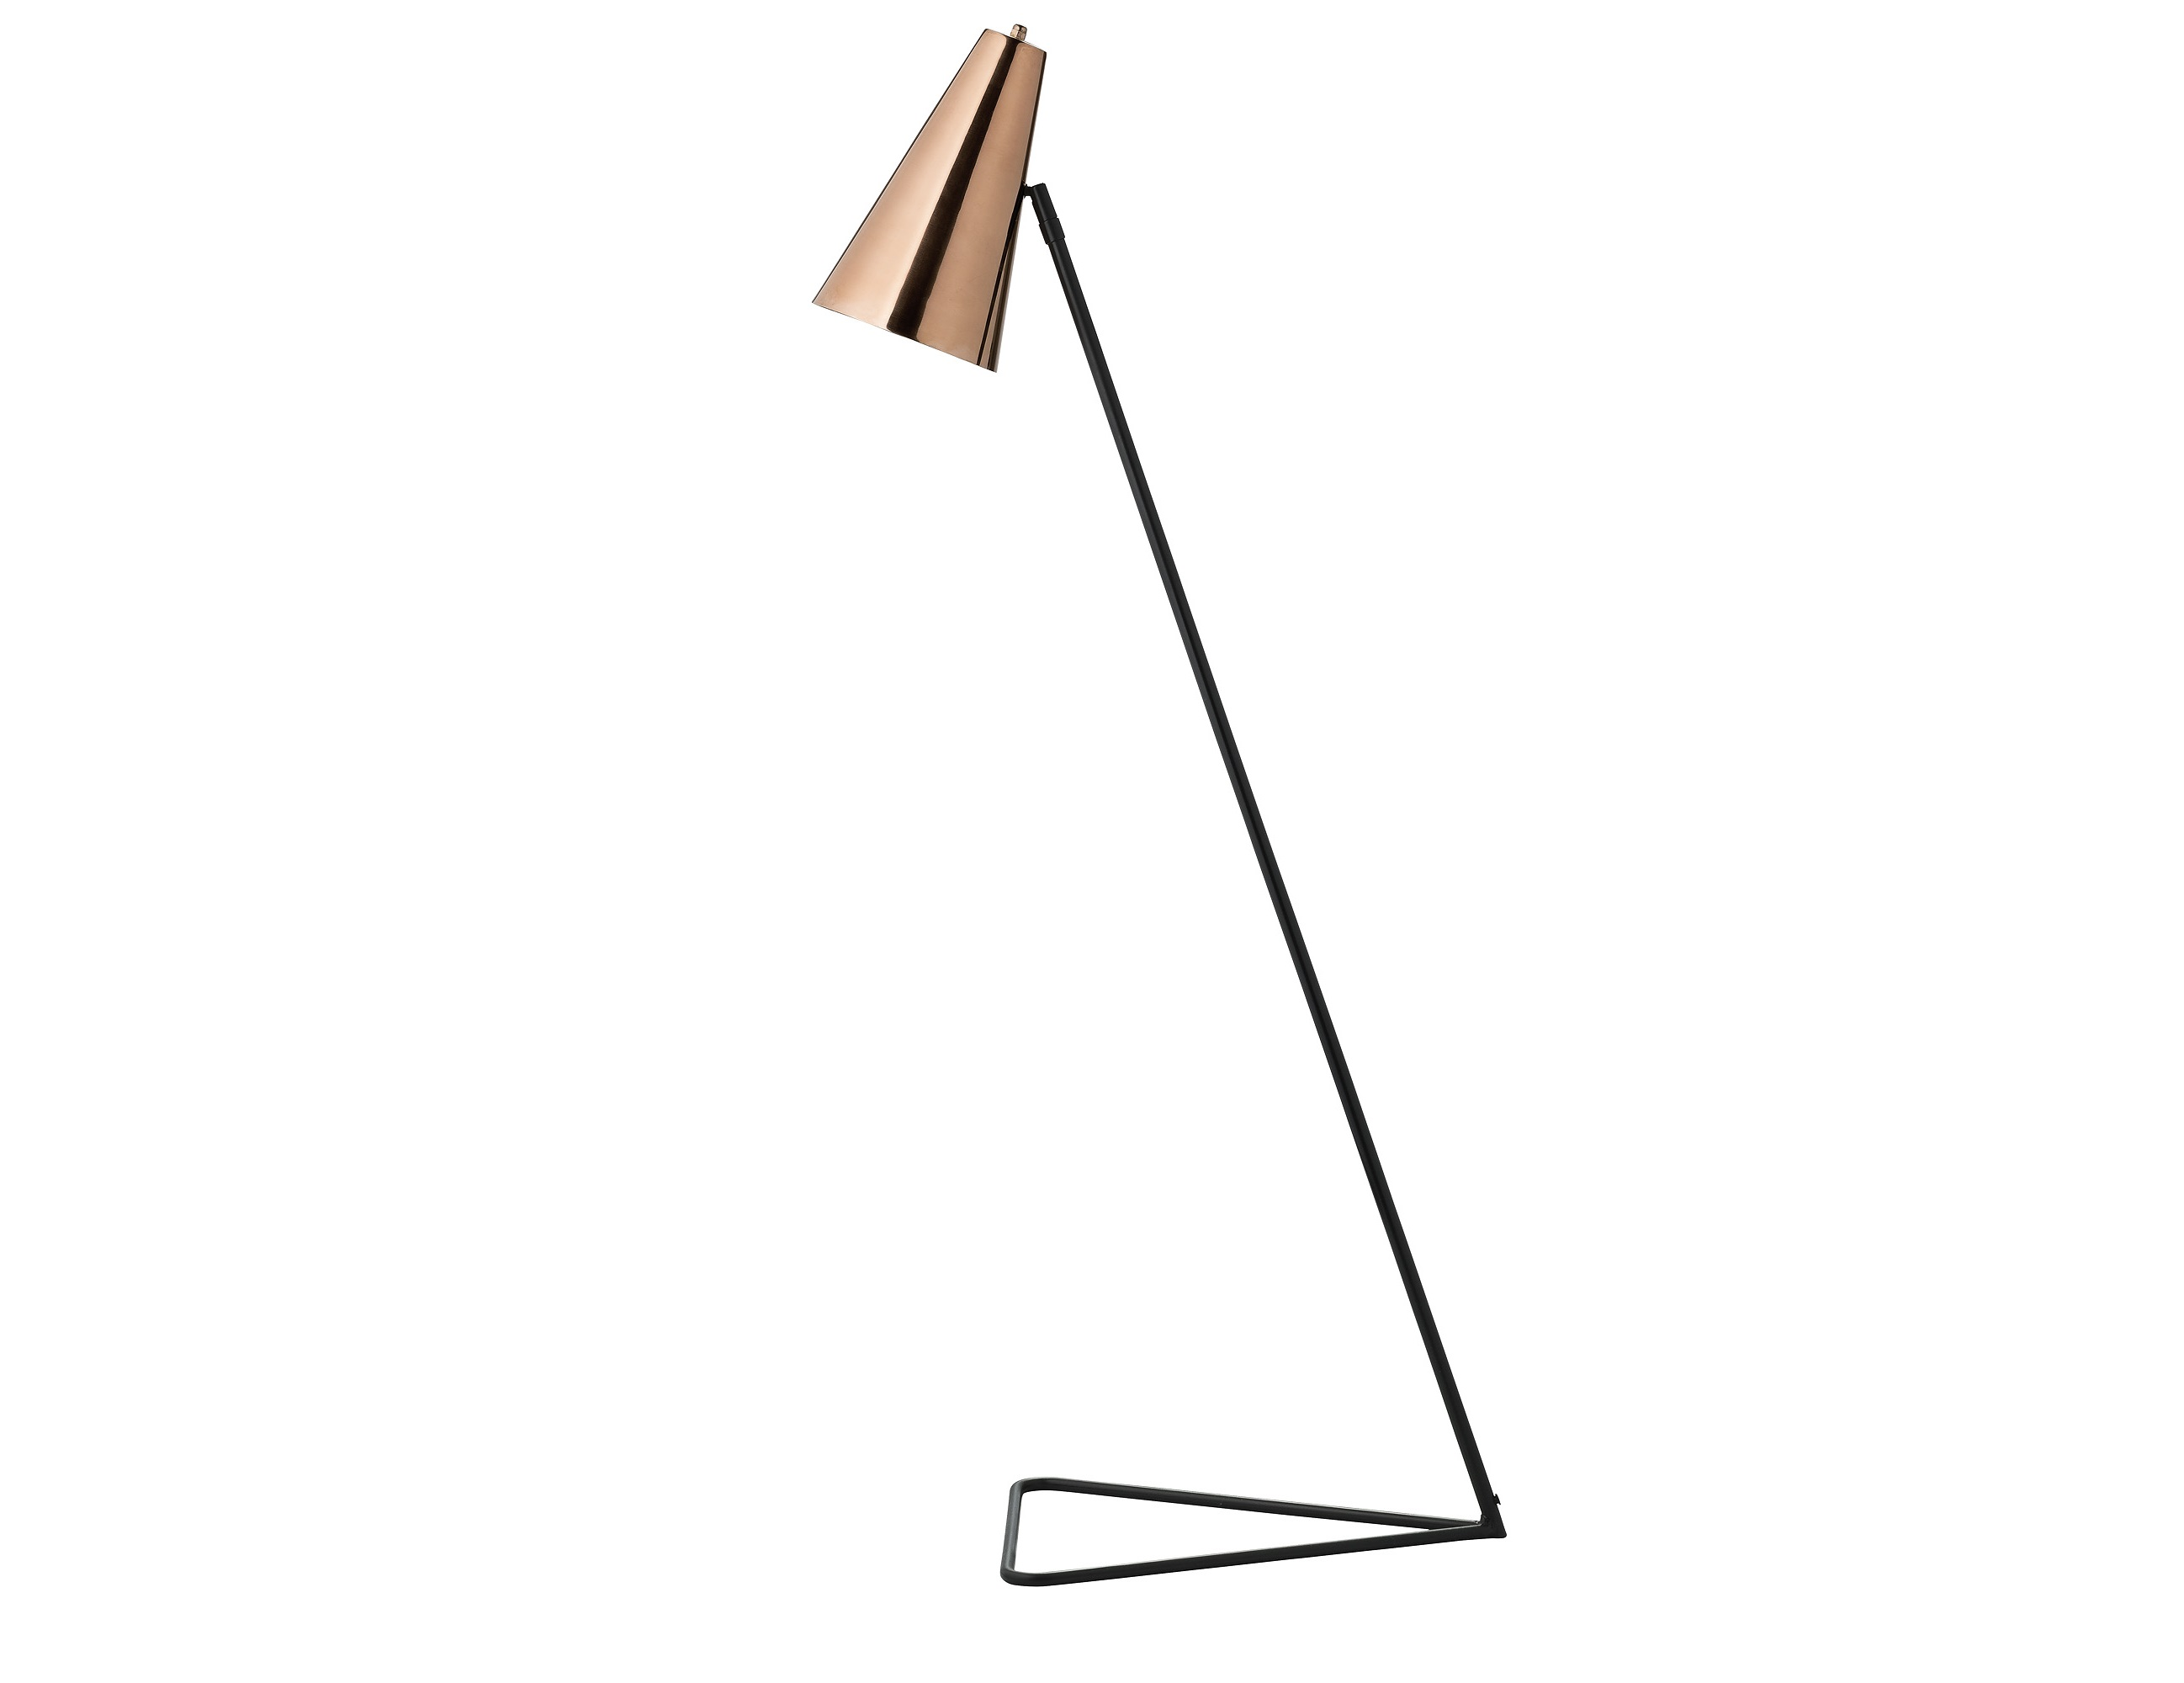 Купить Напольная лампа Cooper с абажуром цвета меди, inmyroom, Дания